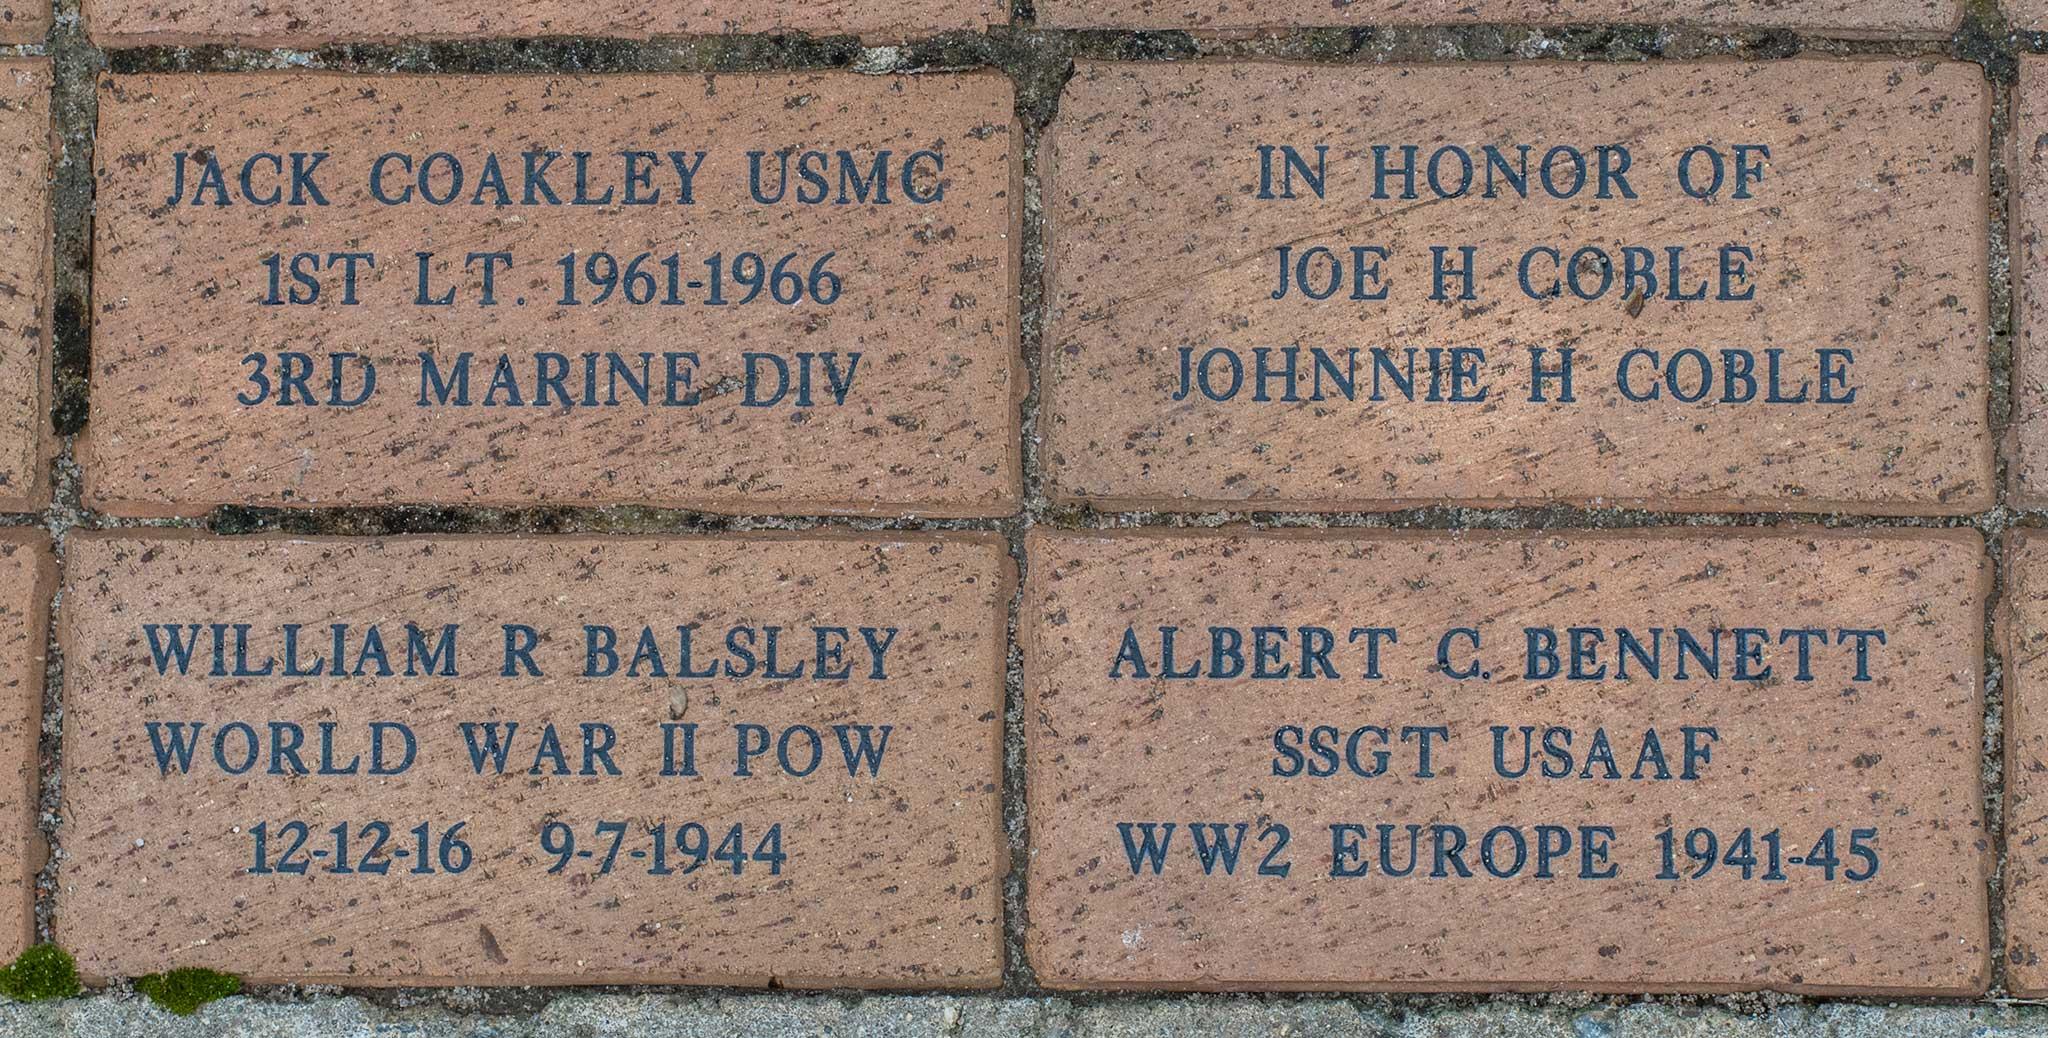 JACK COAKLEY USMC 1ST LT. 1961-1966 3RD MARINE DIV